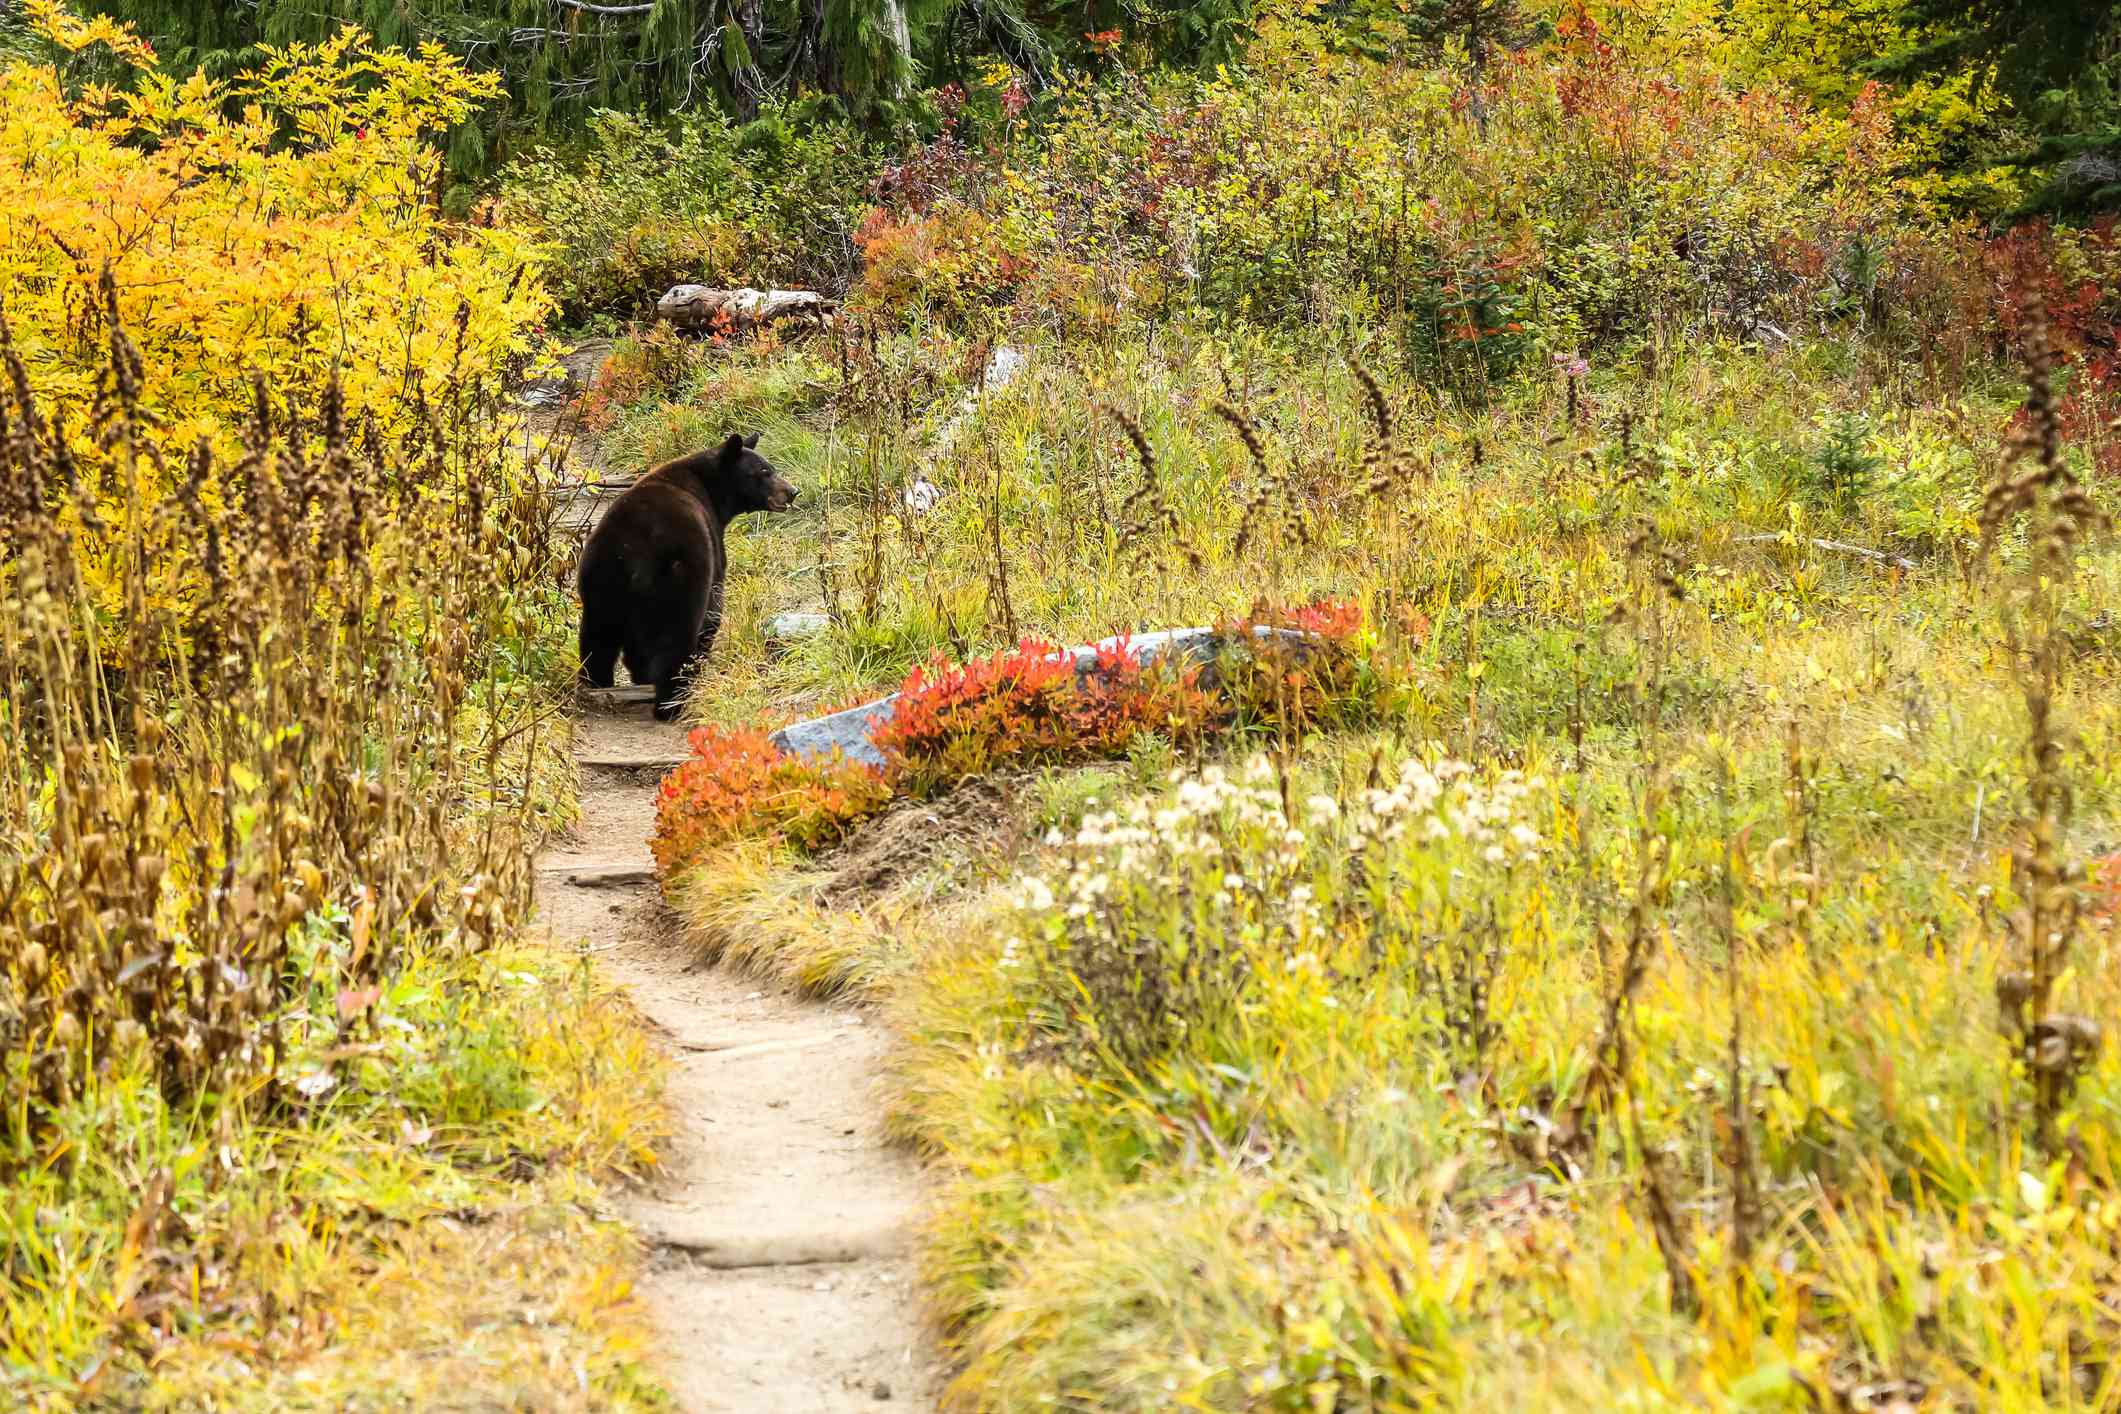 Mother Black bear looks for her cubs as she walks along the Wonderland Trail inside Mount Rainier National Park.